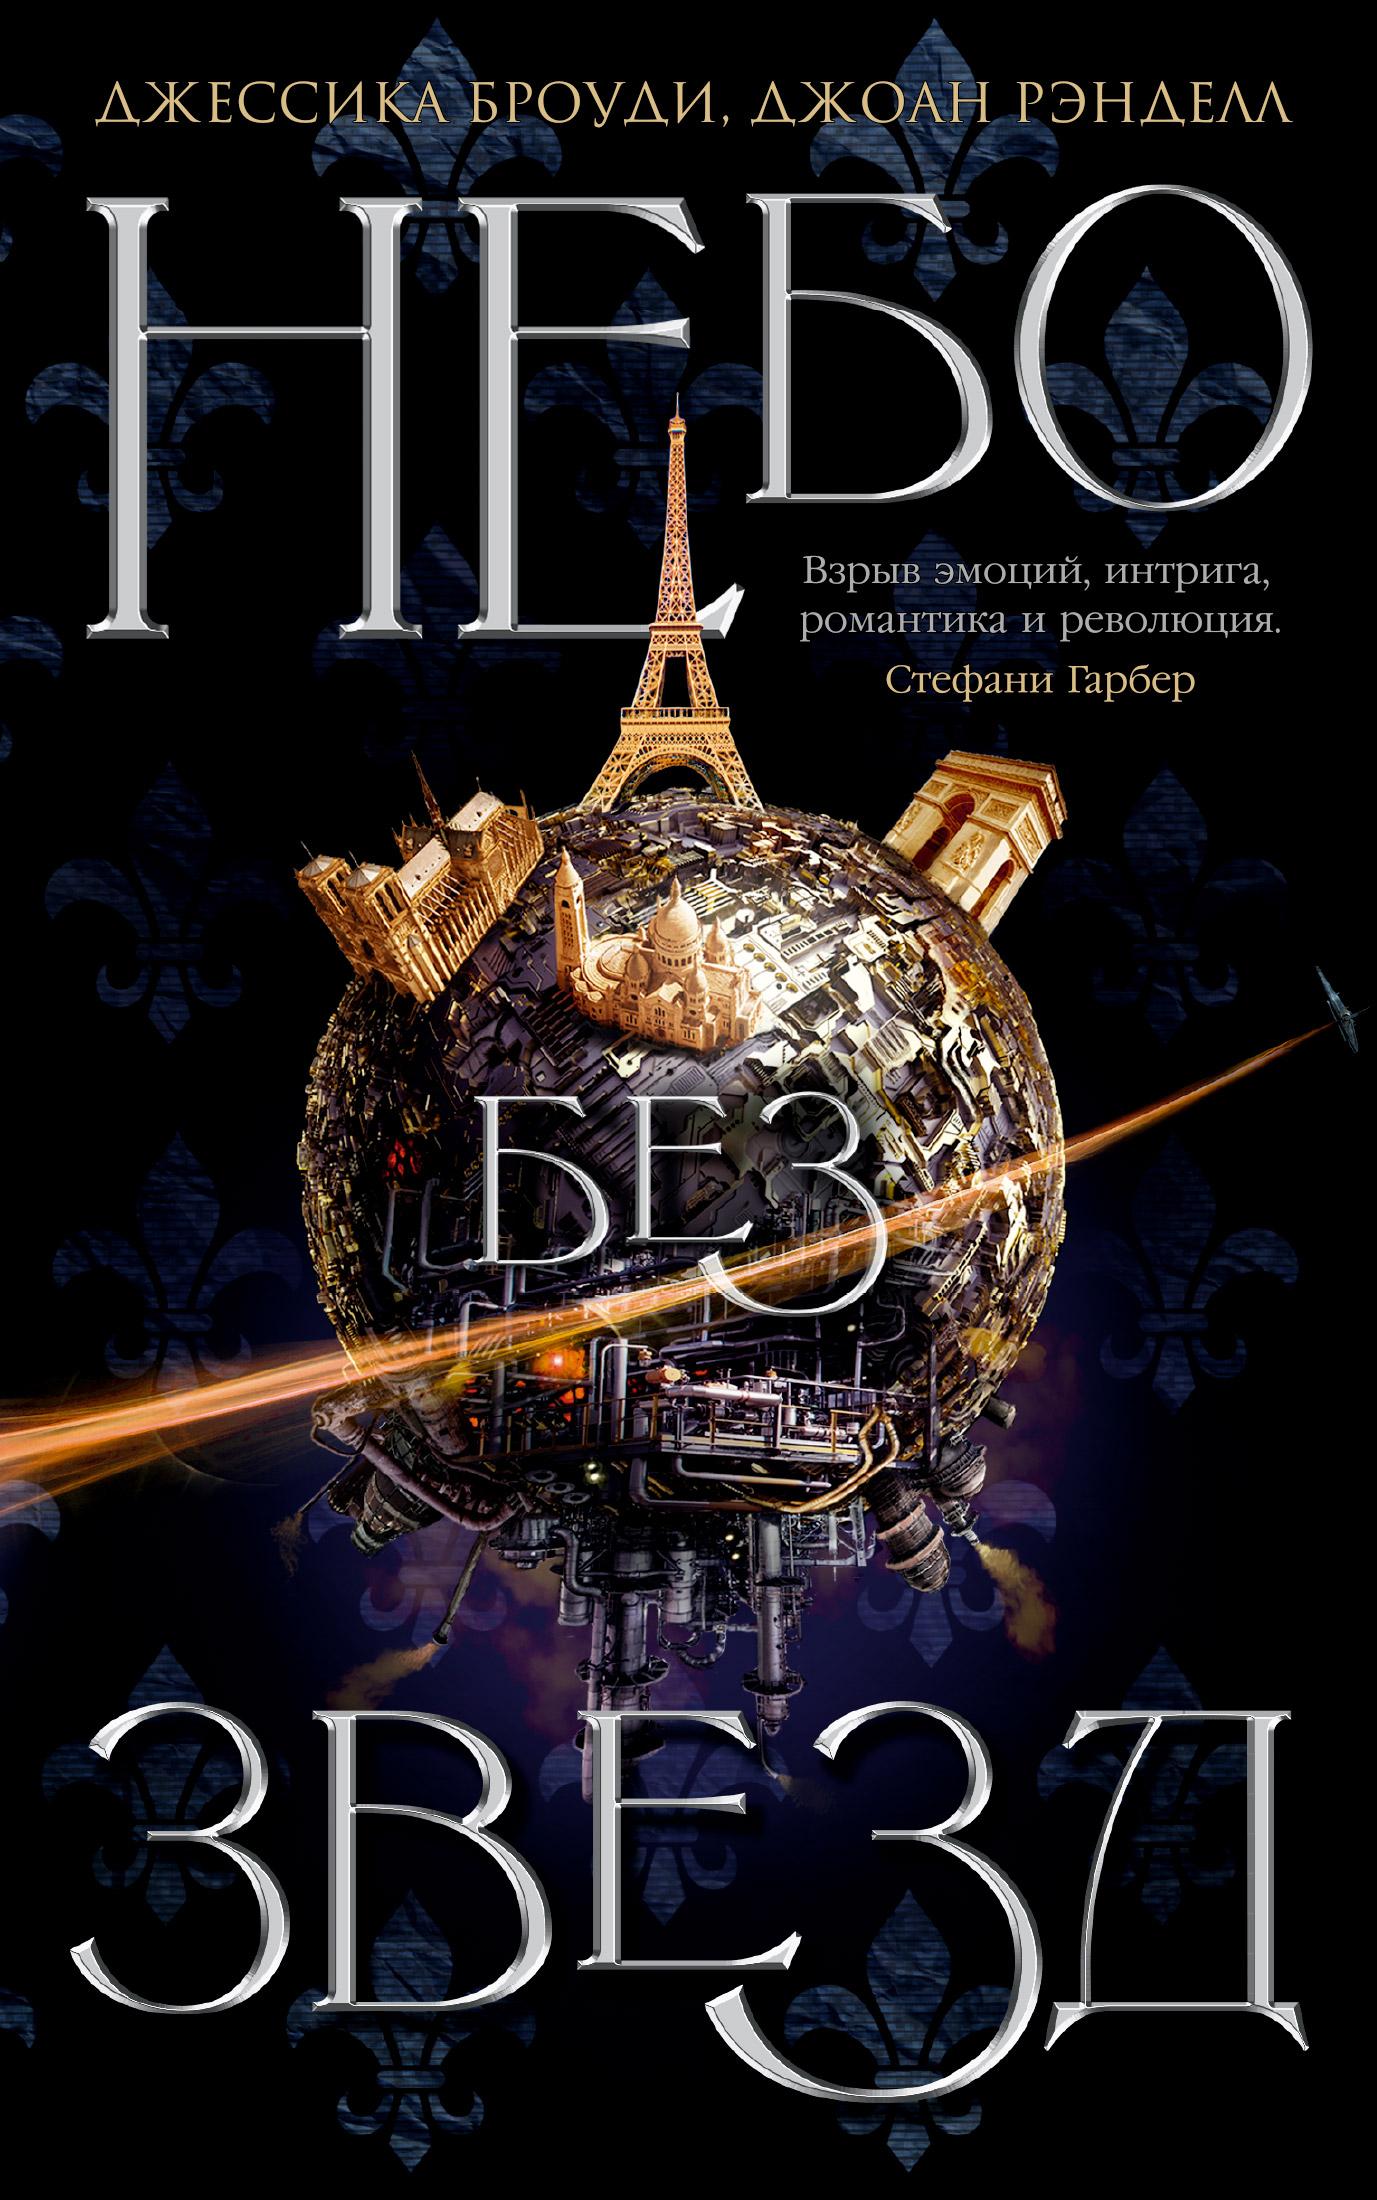 Купить книгу Небо без звезд, автора Джессики Броуди